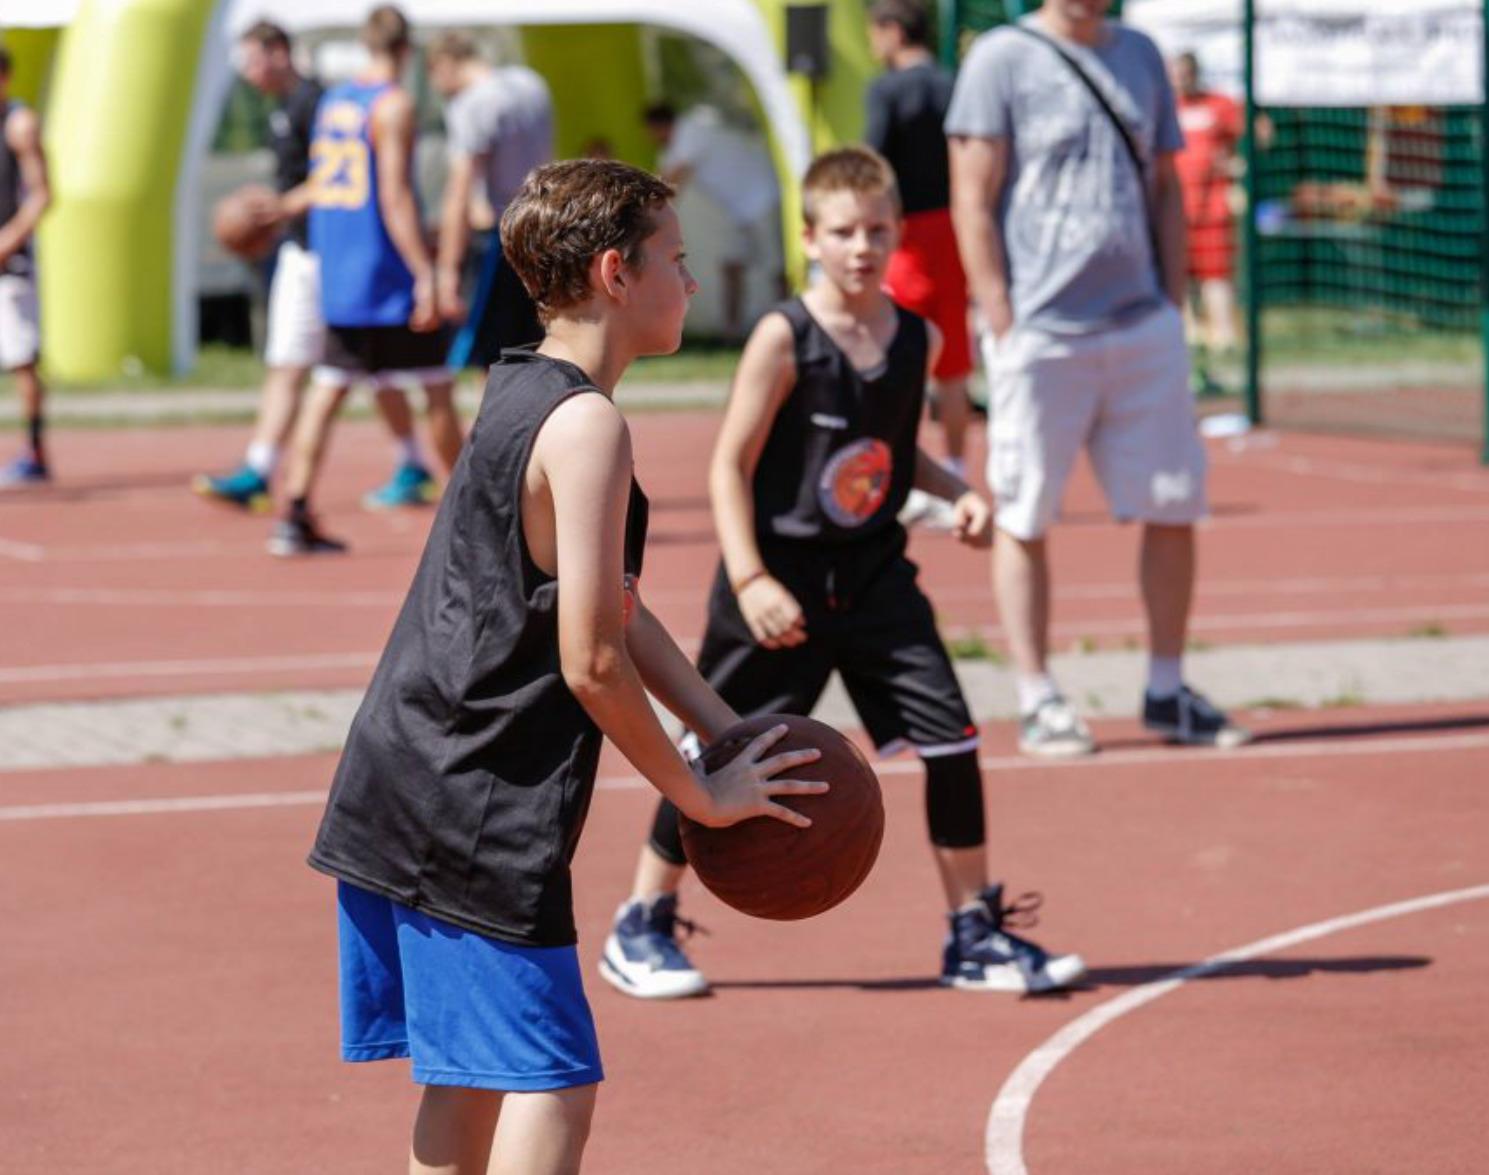 mini-koszykówka